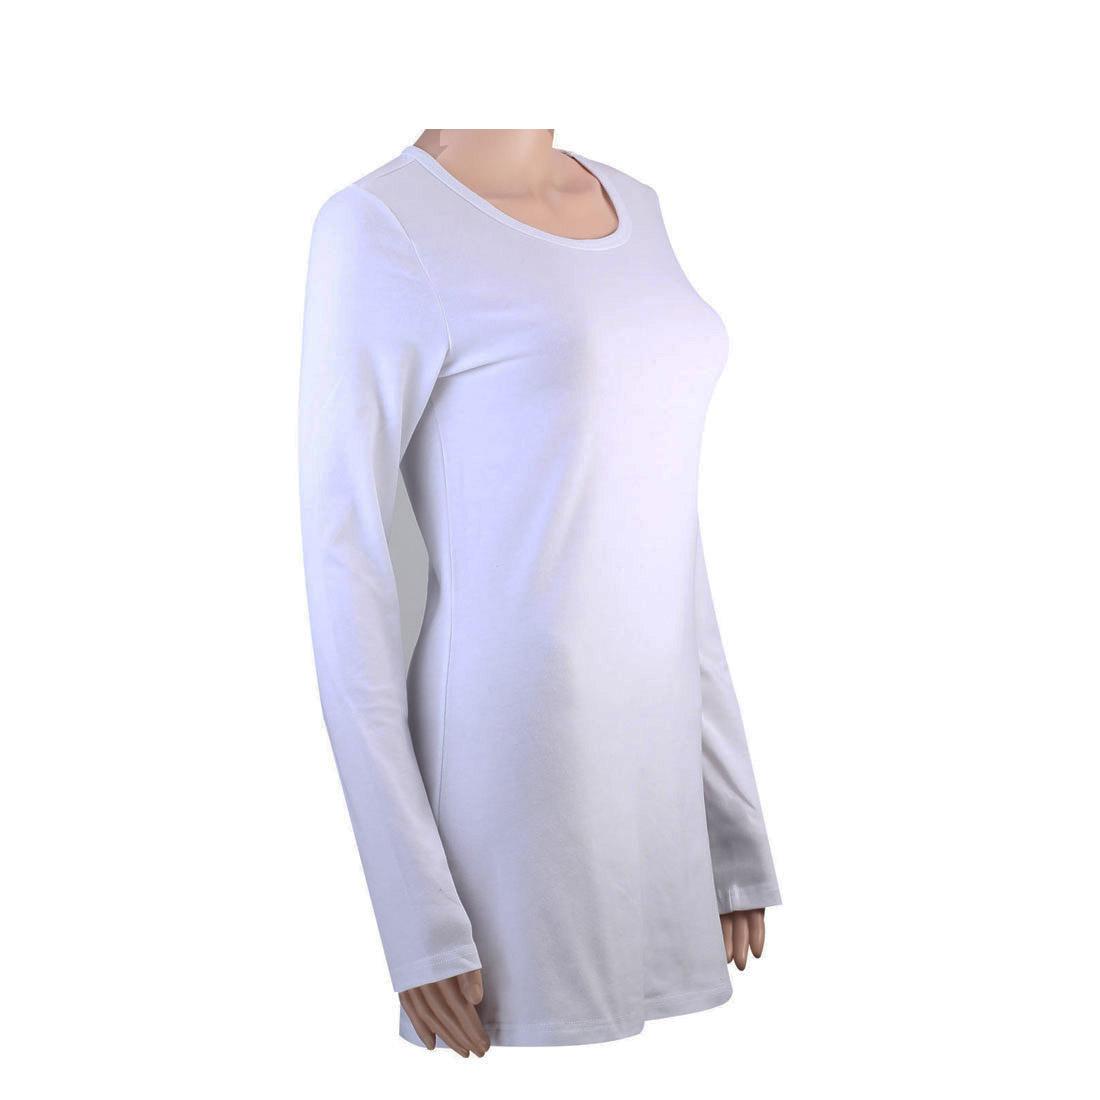 100 Cotton Womens Long Sleeve T Shirt Ladies T Shirts